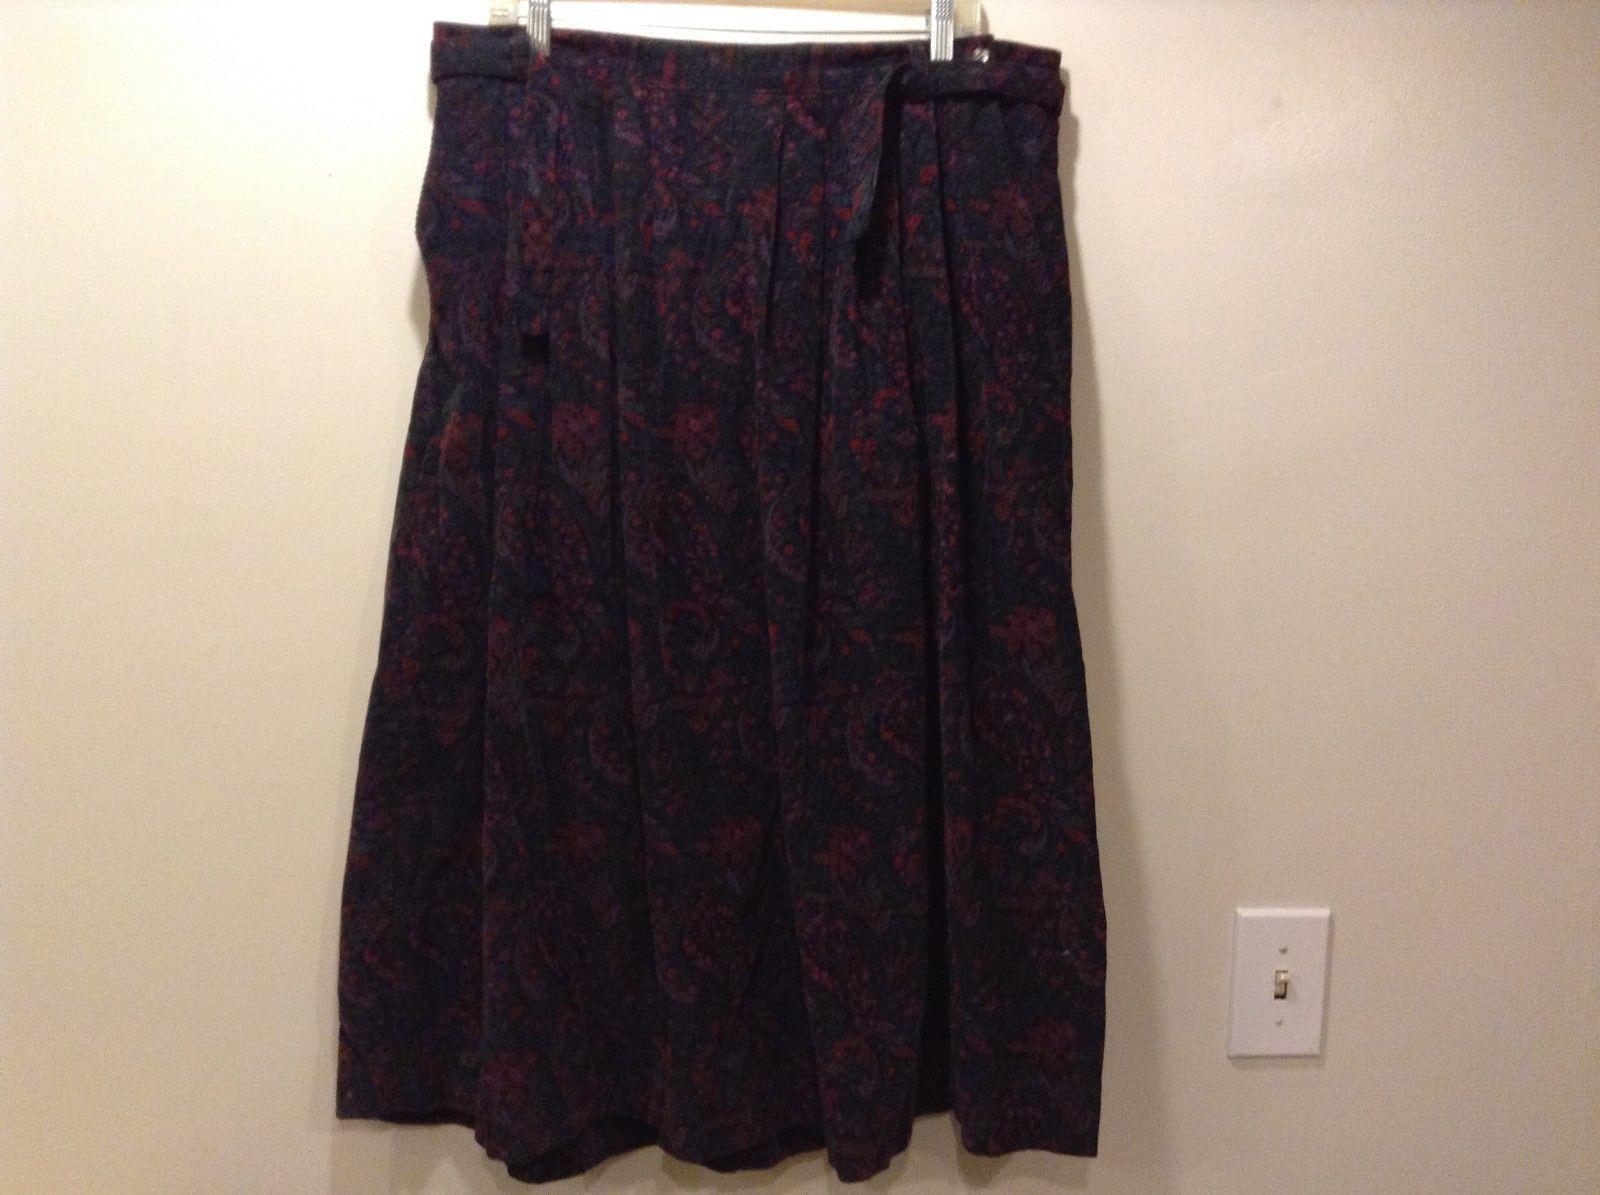 L.L. Bean Ladies Paisley Multicolor Flared Skirt Sz 20R